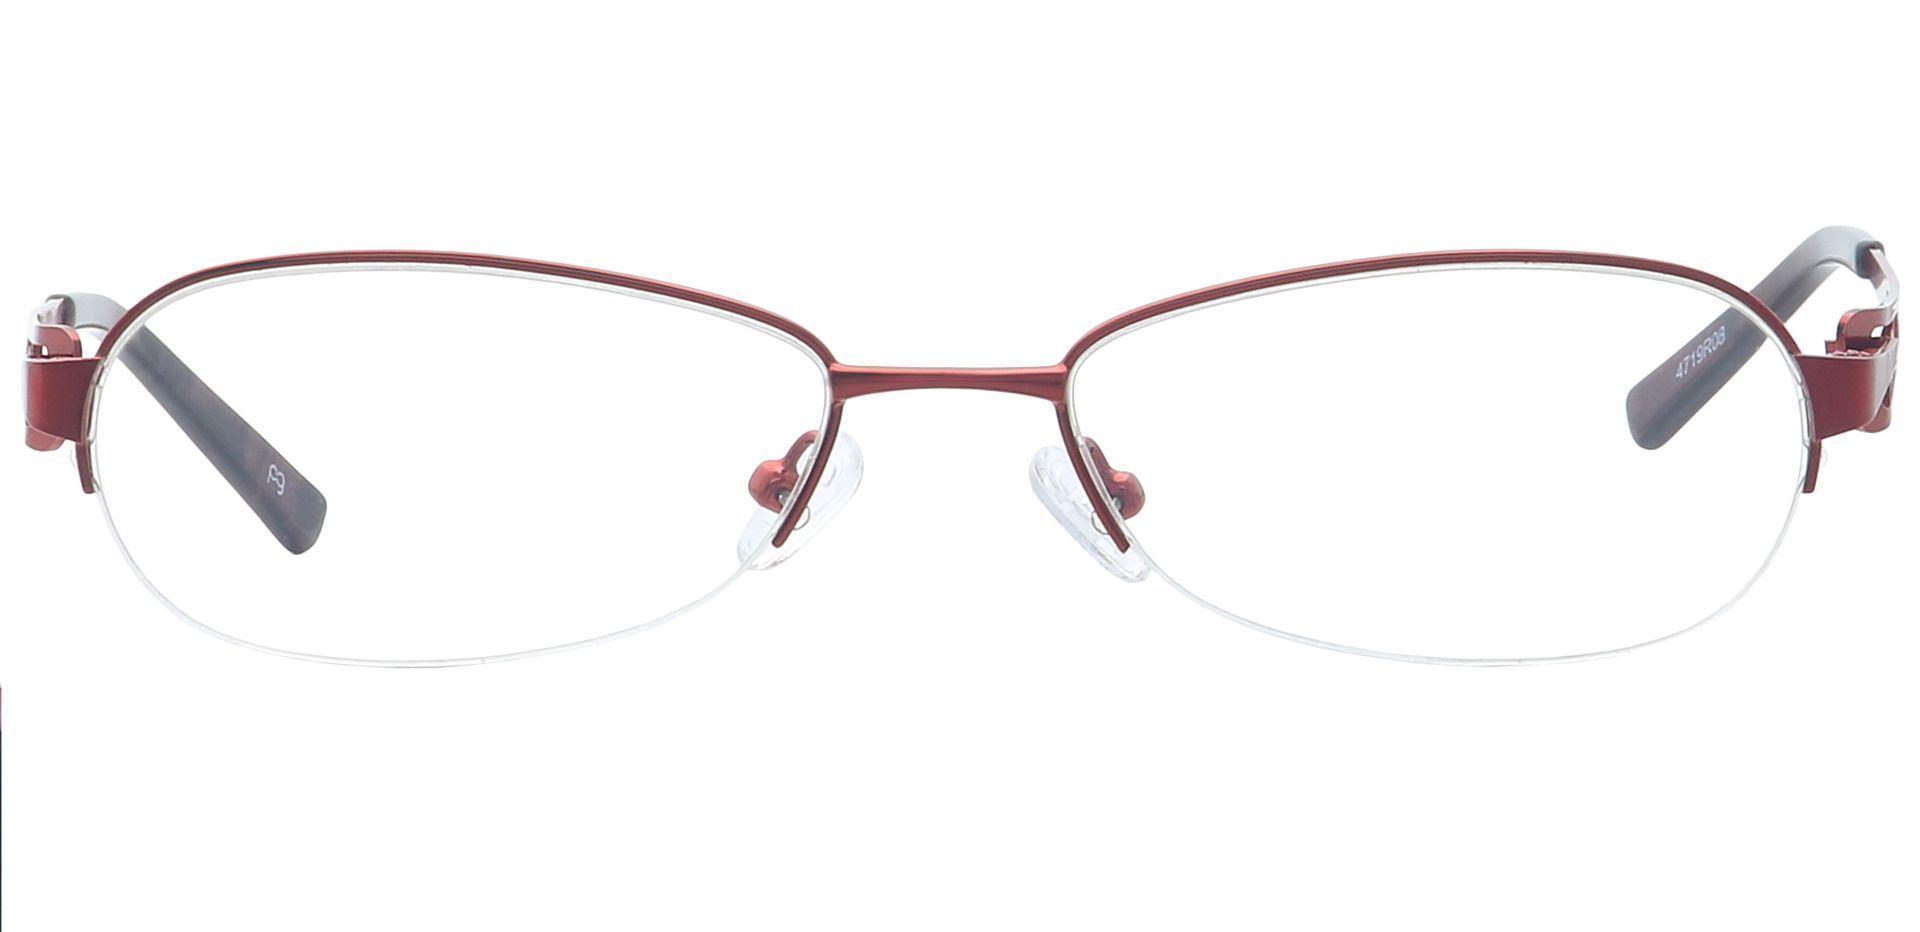 Marsha Oval Eyeglasses Frame - Red